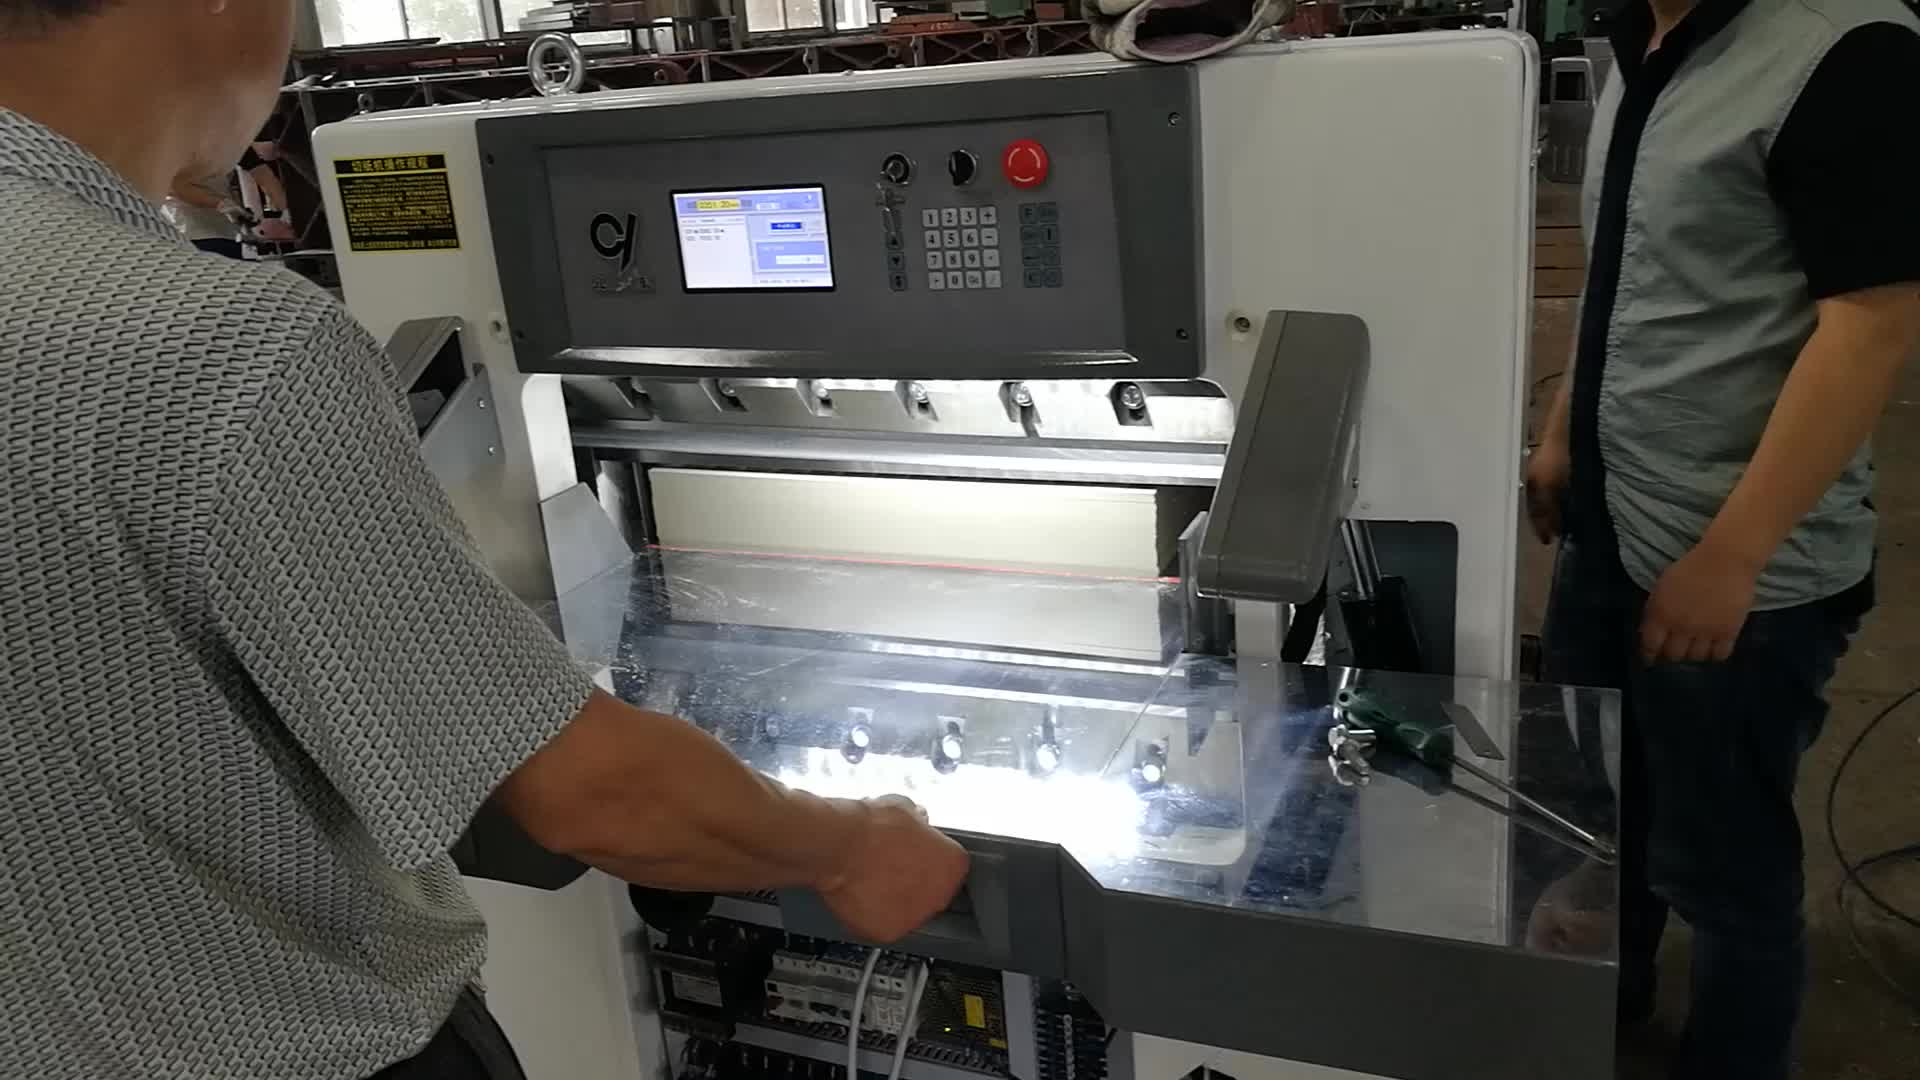 QZK670ไฟฟ้าตัดเครื่องcncตัดA4เครื่องตัดกระดาษ